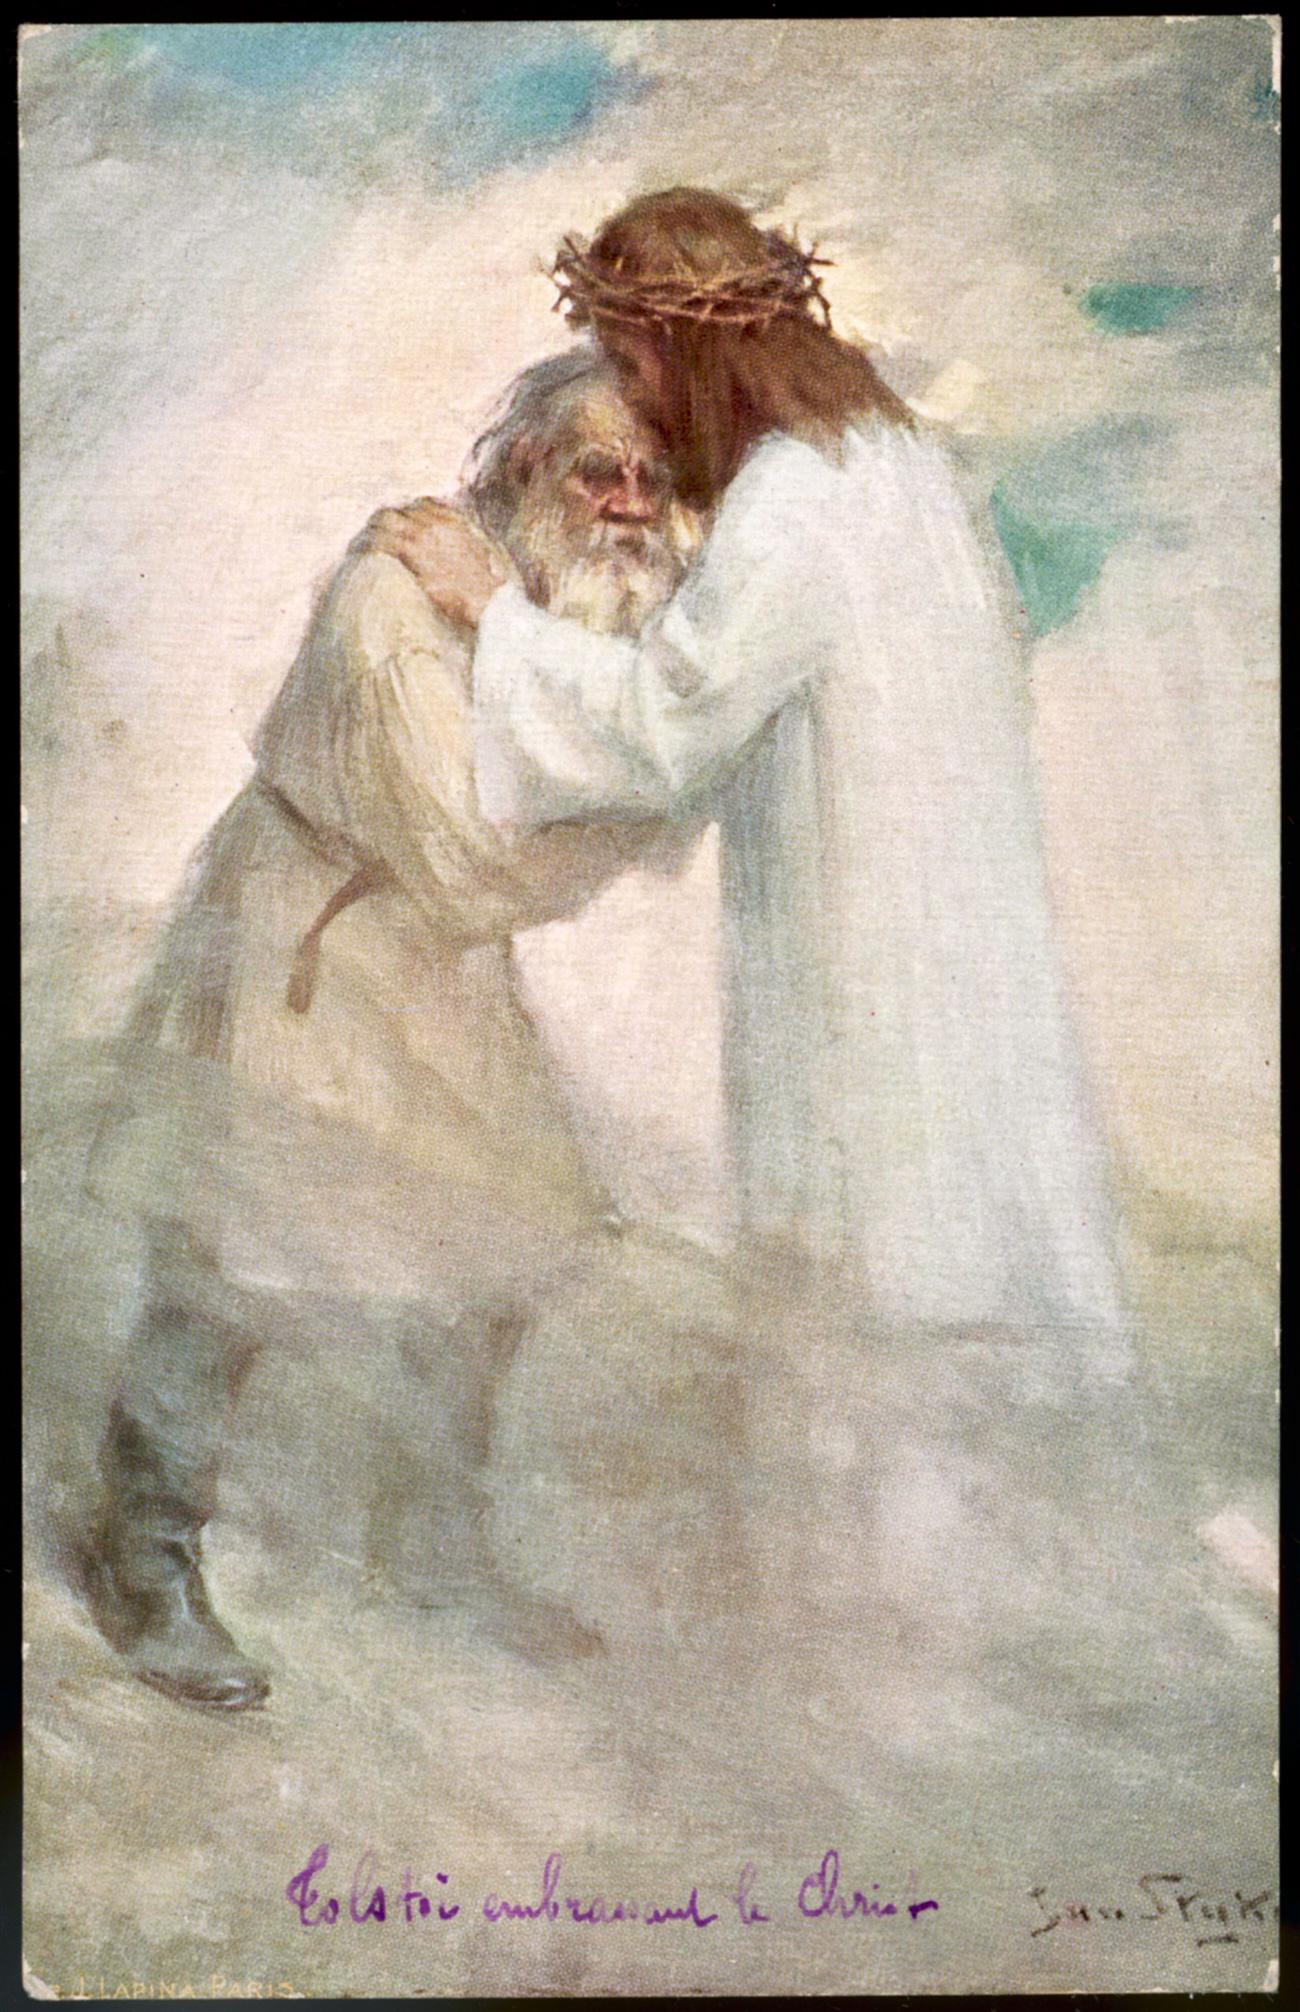 Jan Styka. Leo Tolstoy Embracing Jesus, 1910. Source: Mary Evans Picture Library/Global Look Press